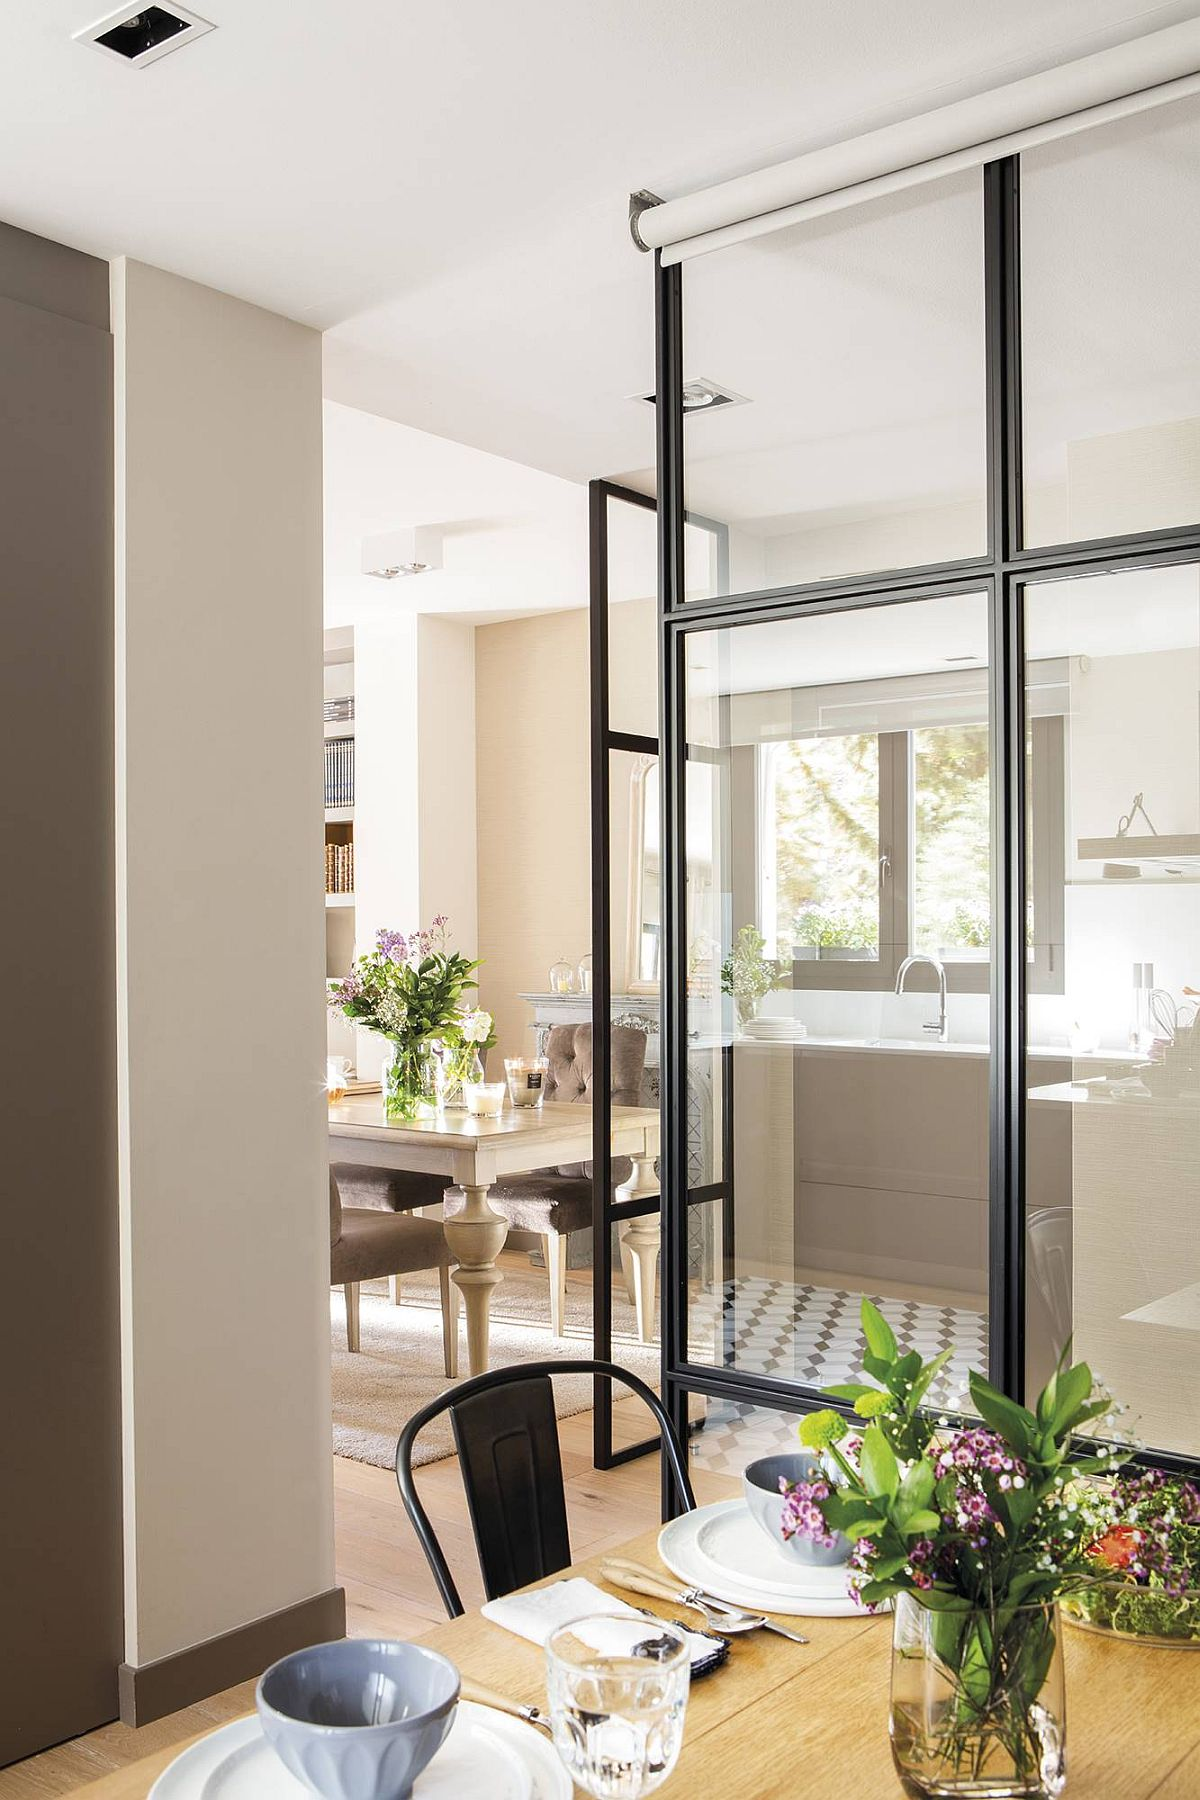 adelaparvu.com despre apartament amenajat in tonuri de bej, design Chari Manzano si Marta Herrera, Foto Pepa Oromi (2)